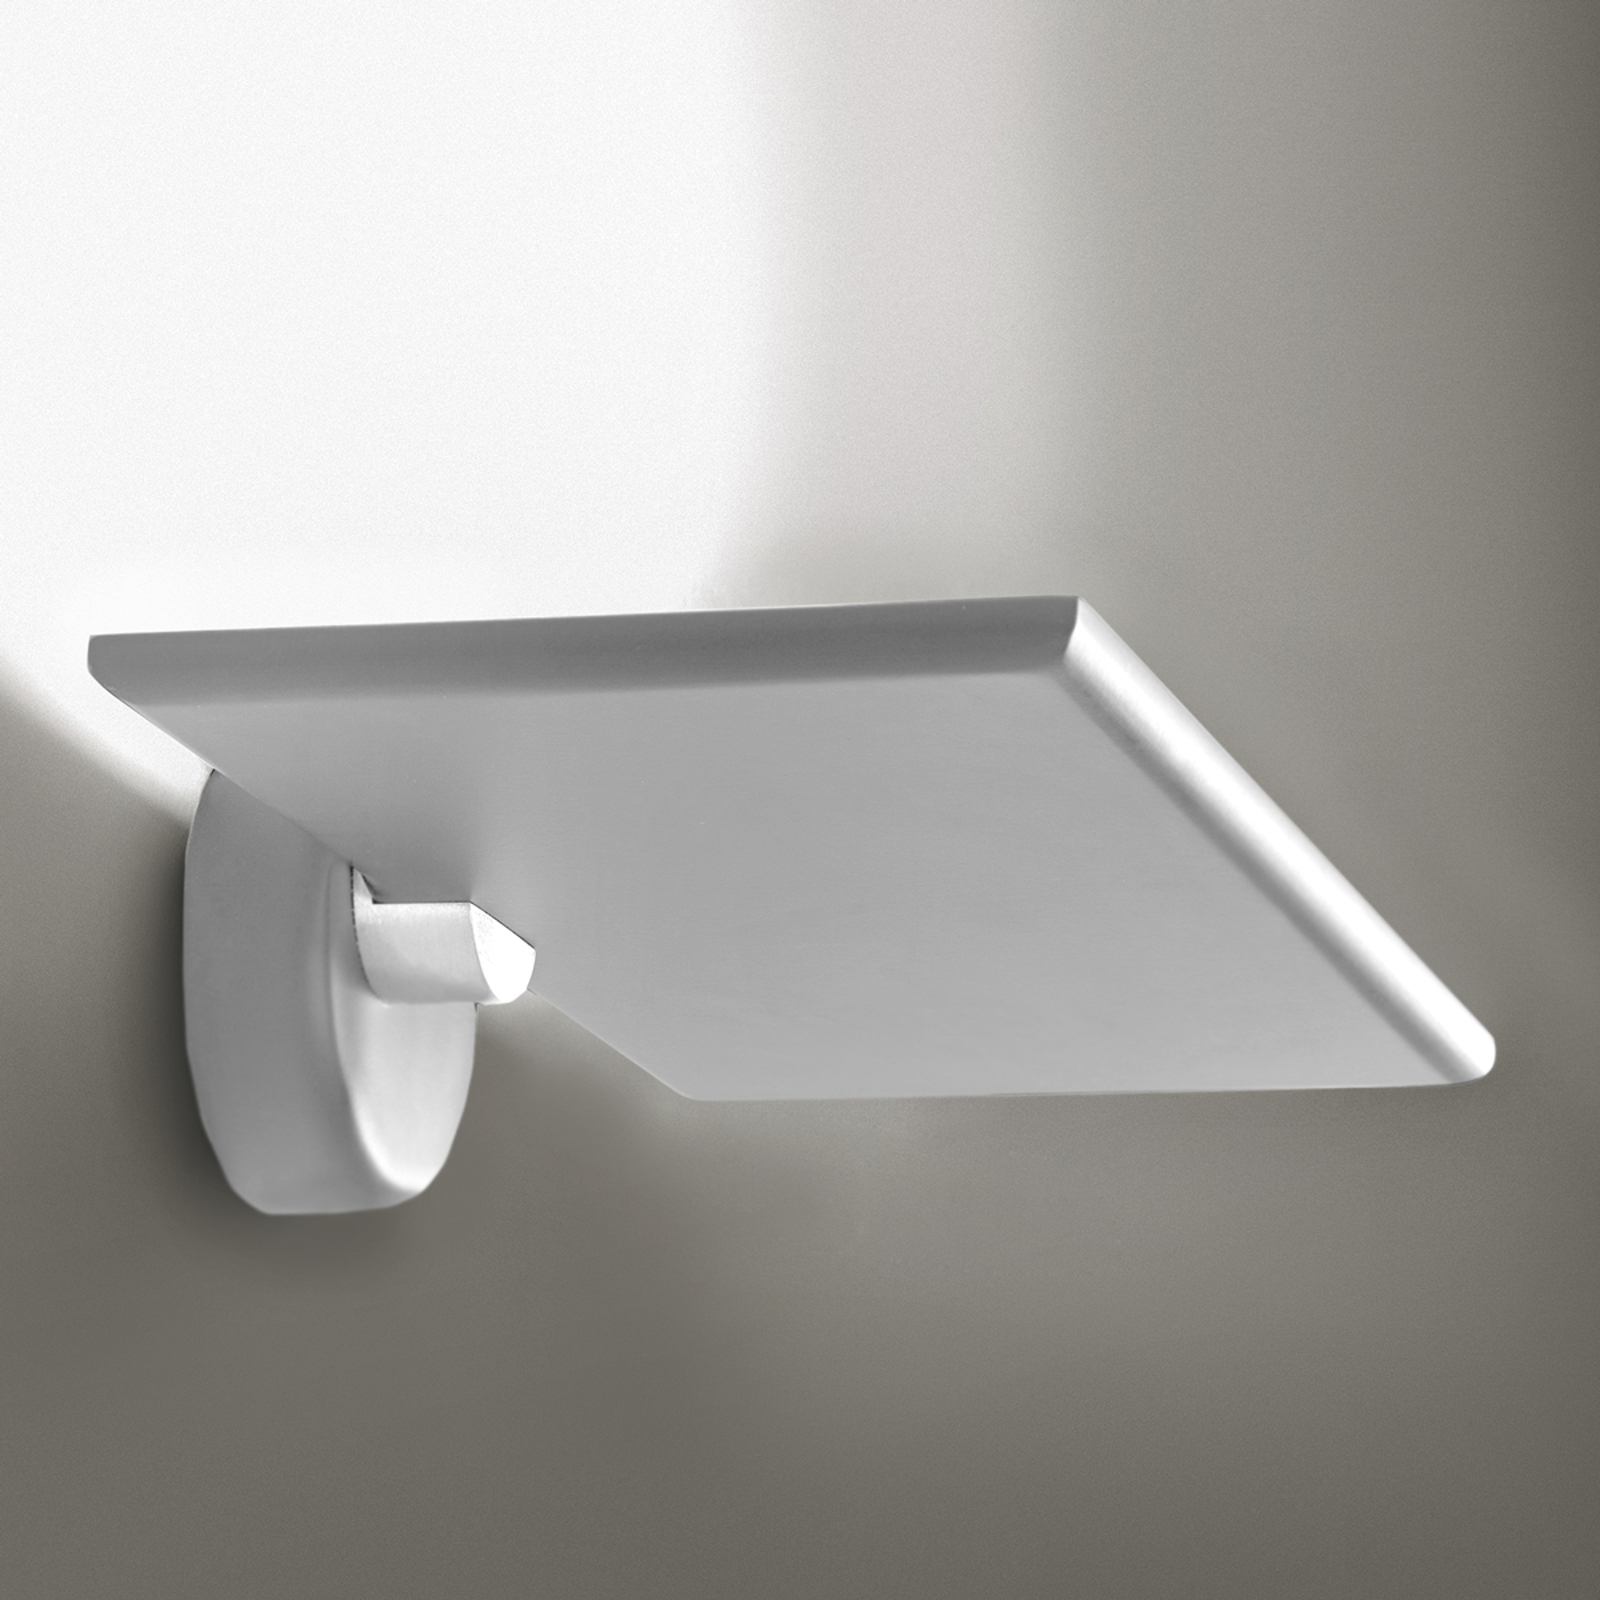 ICONE GiuUp LED-uplight væglampe 20 W, hvid